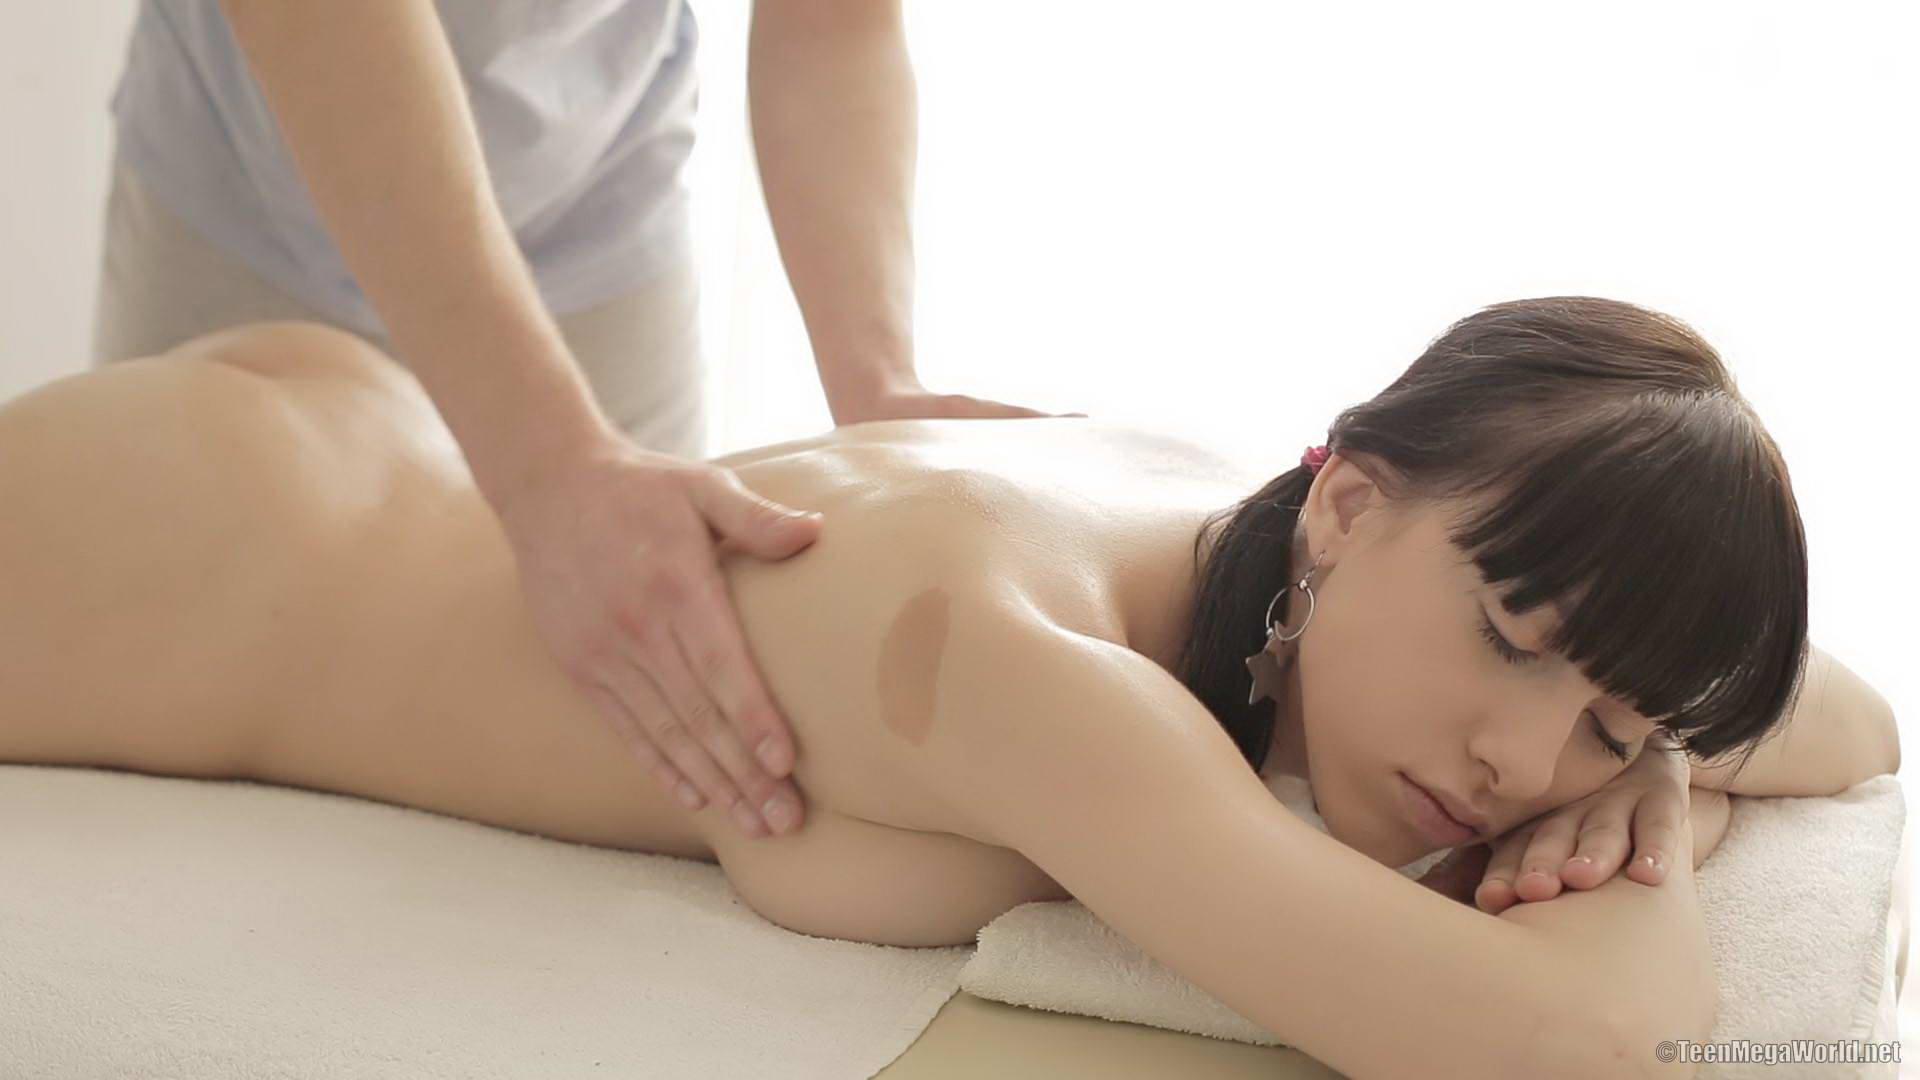 Skinny butt sex